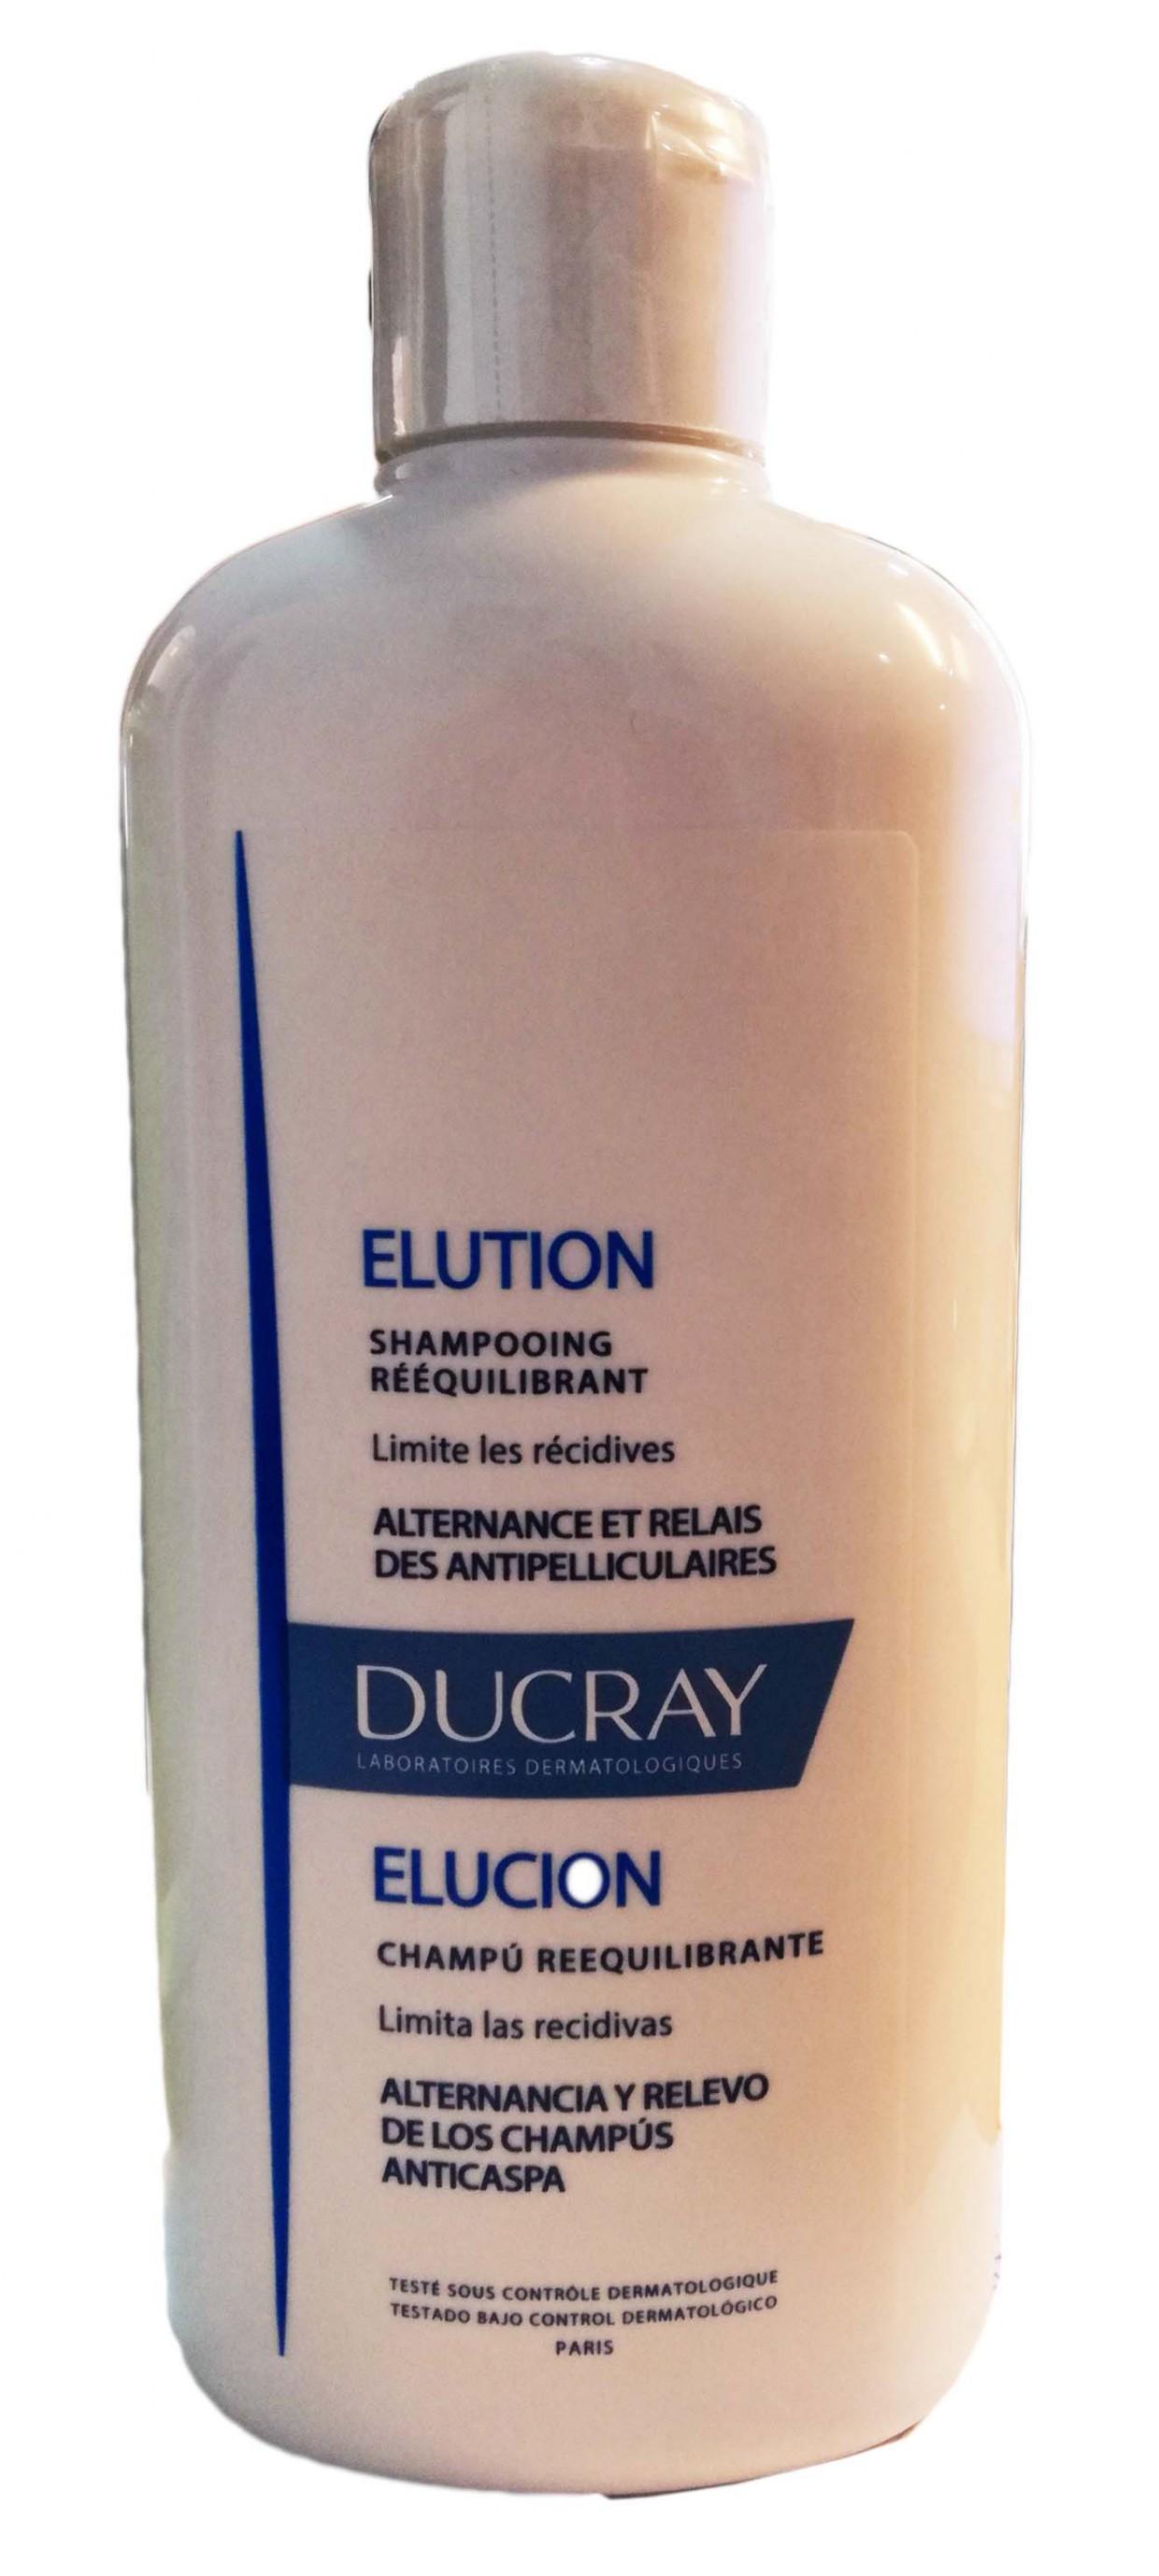 Ducray Champú Elution Reequilibrante 400ml